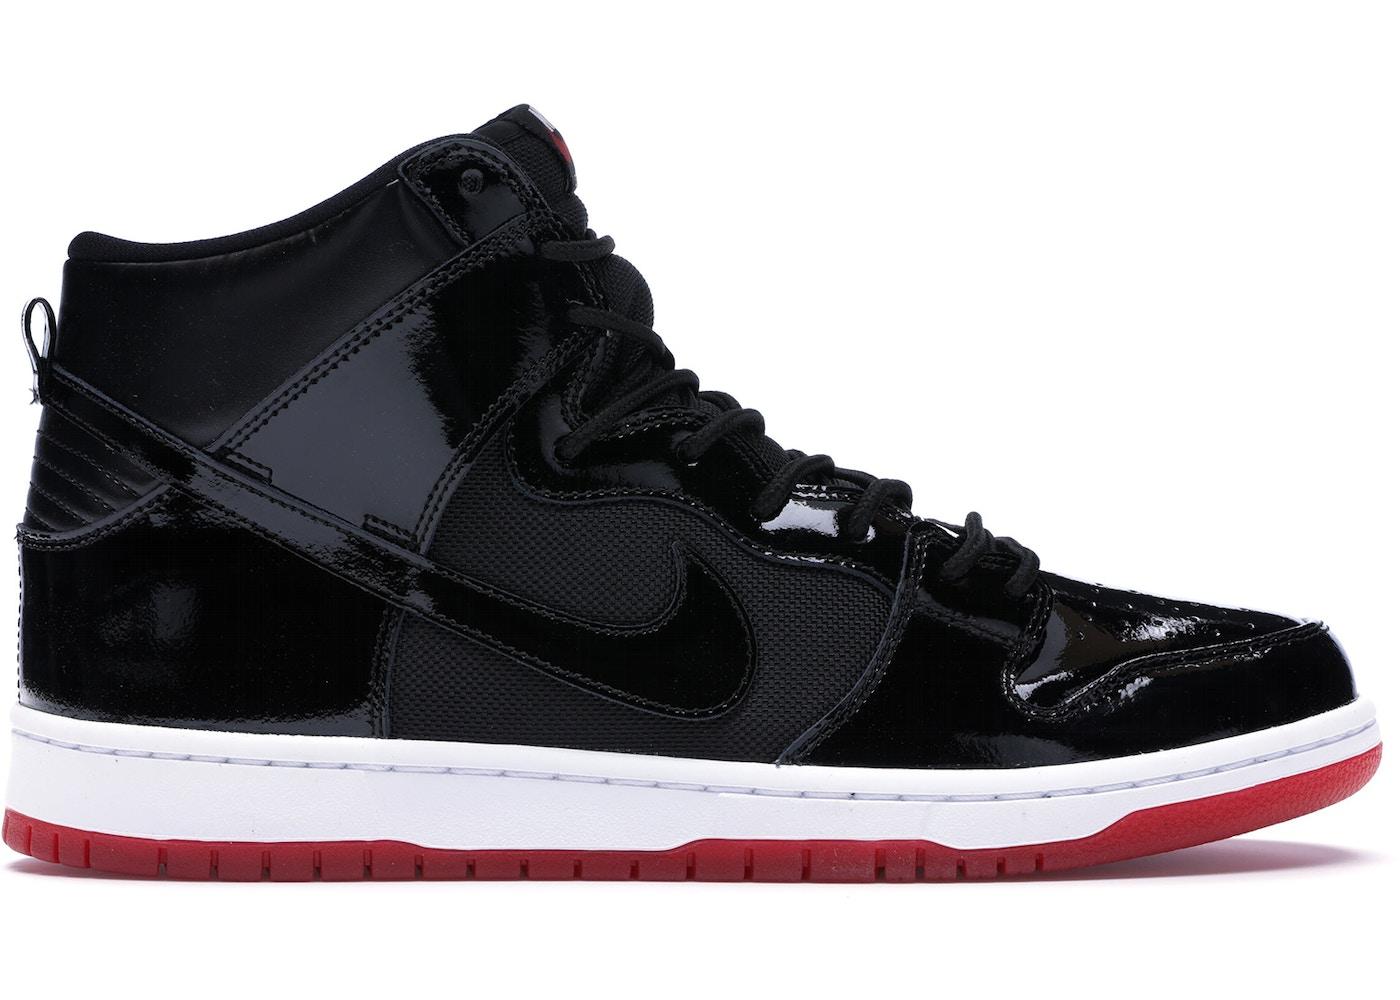 b2cdbcced65ba5 Buy Nike SB Shoes   Deadstock Sneakers